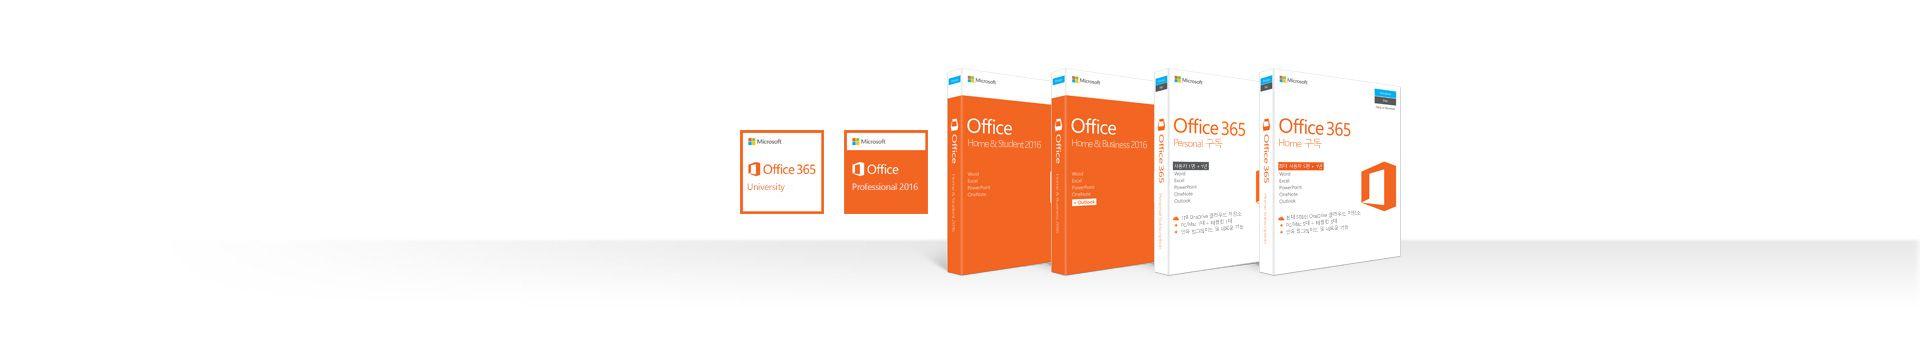 Office 구독과 PC용 독립 실행형 제품을 나타내는 여러 개의 상자